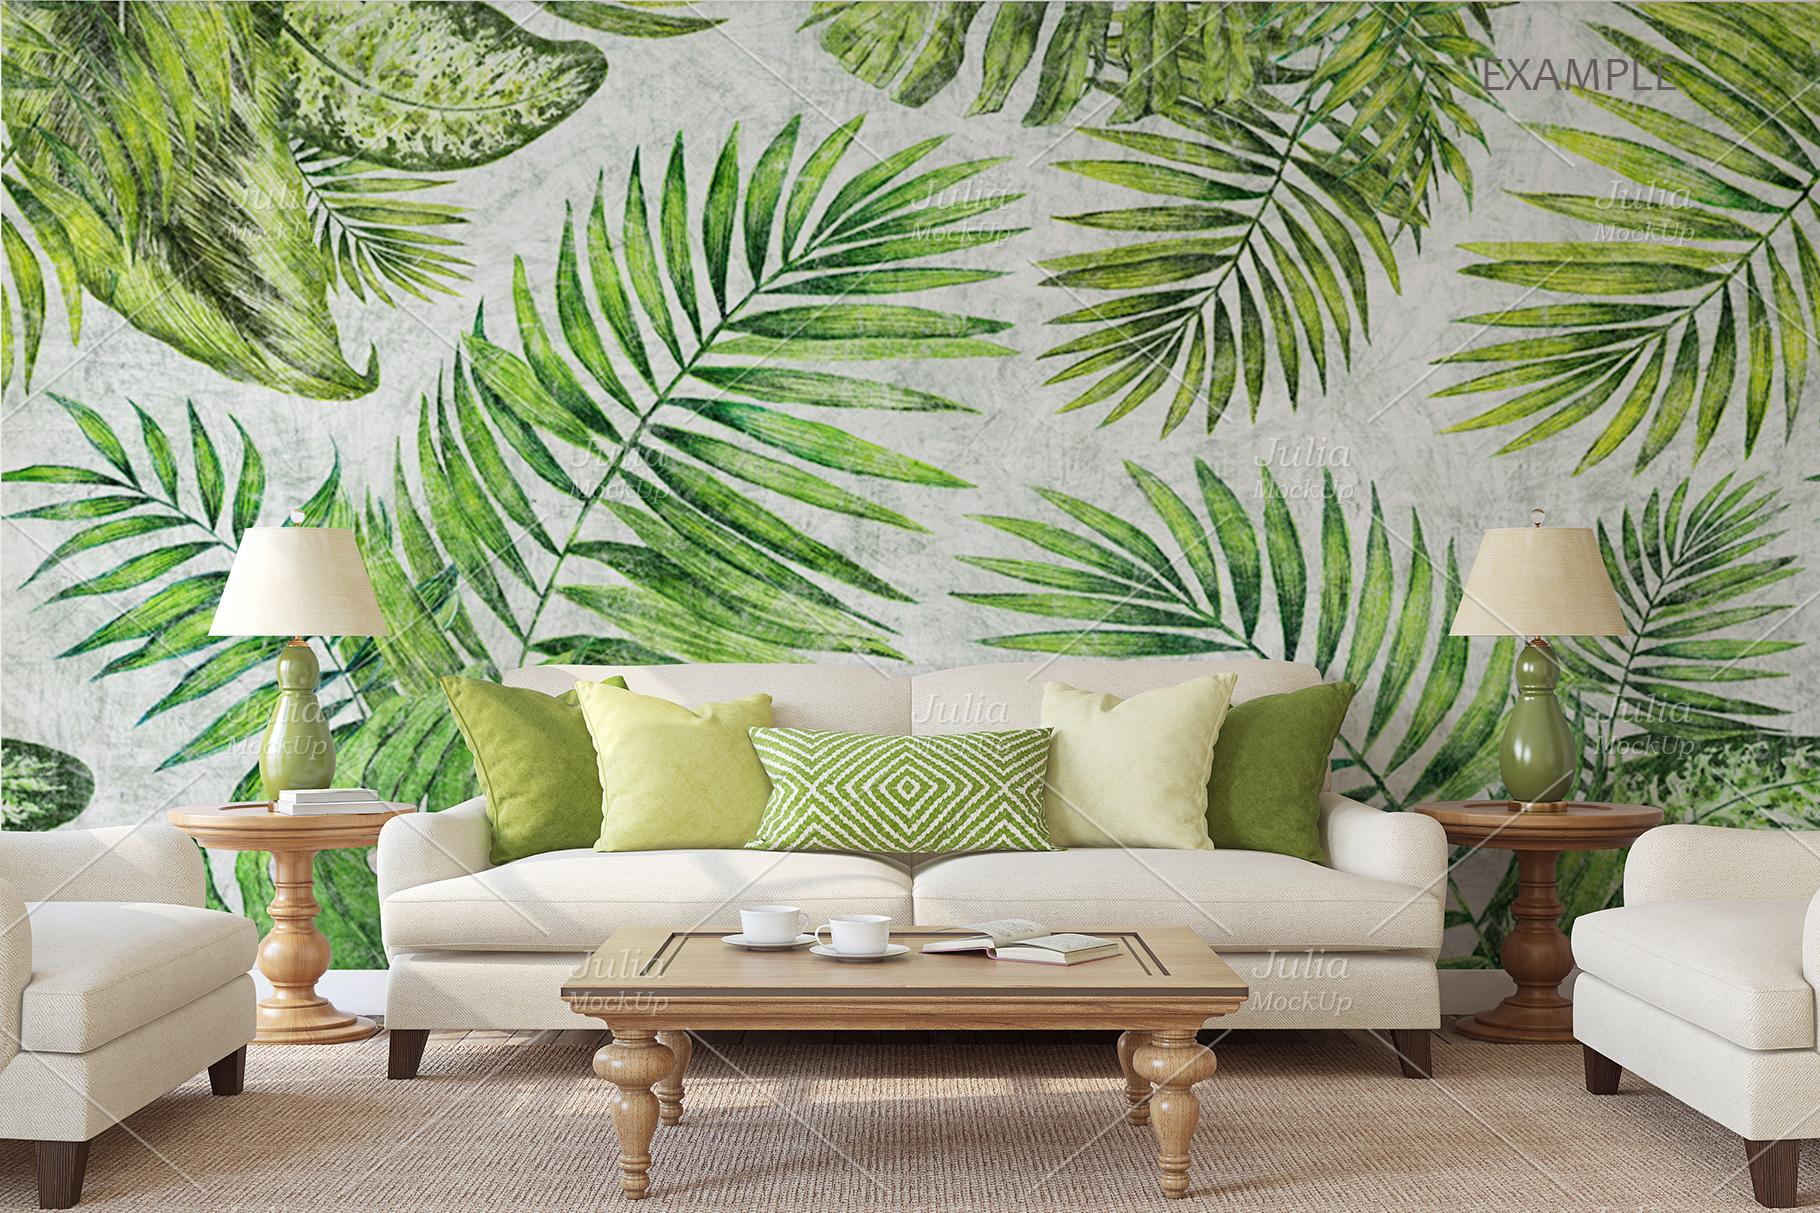 Living-room interiors. Wall&Frames Mockup. example image 5